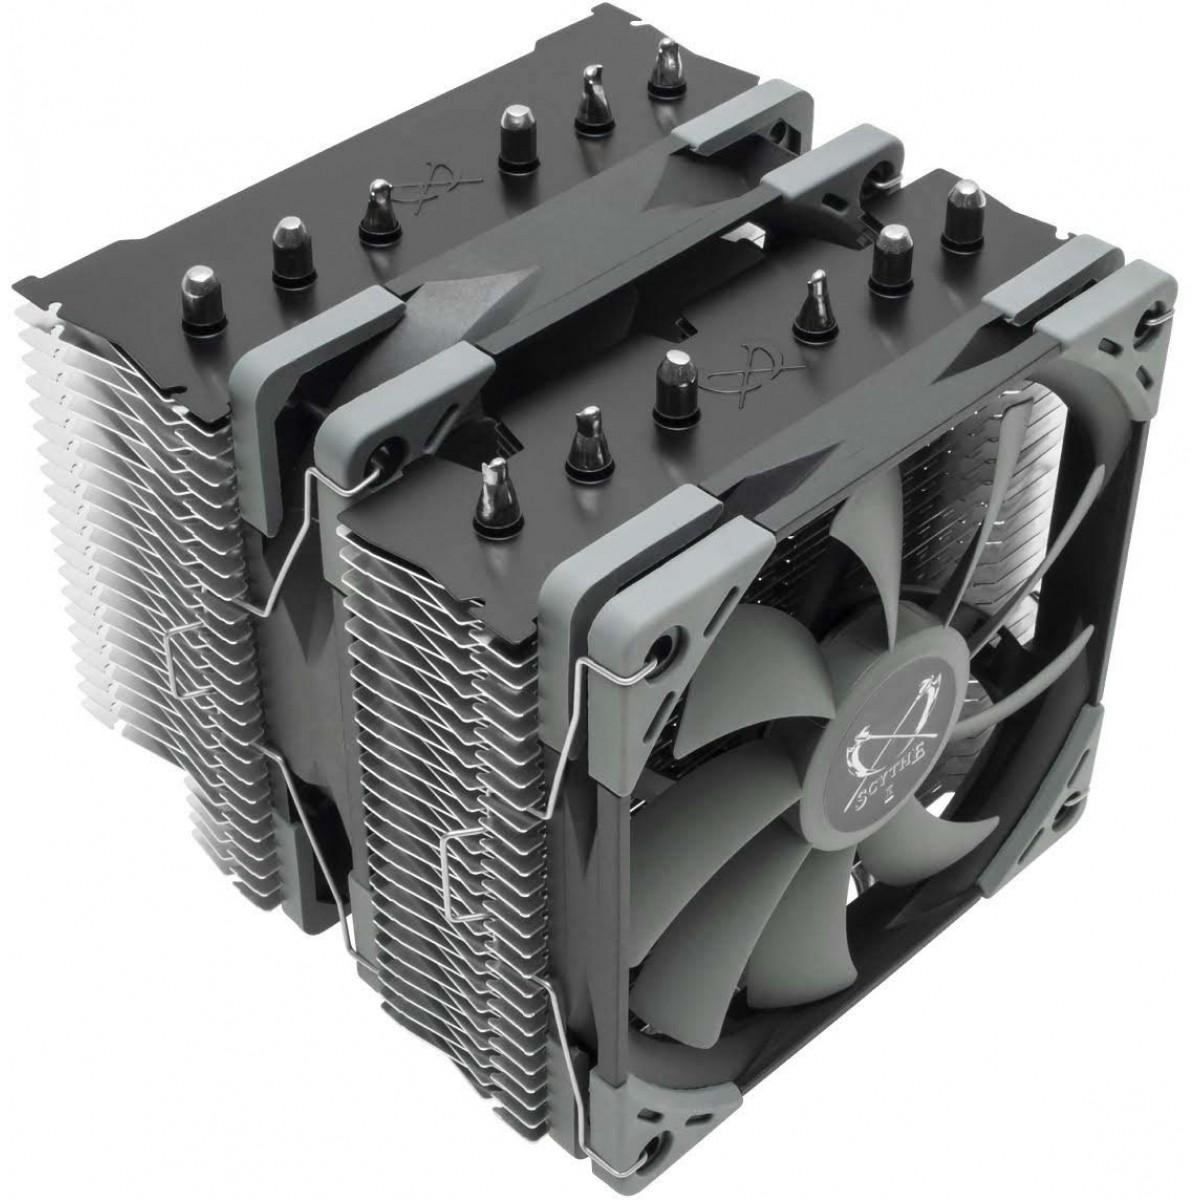 Cooler para Processador Scythe Fuma 2 120mm, Intel-AMD, SCFM-2000